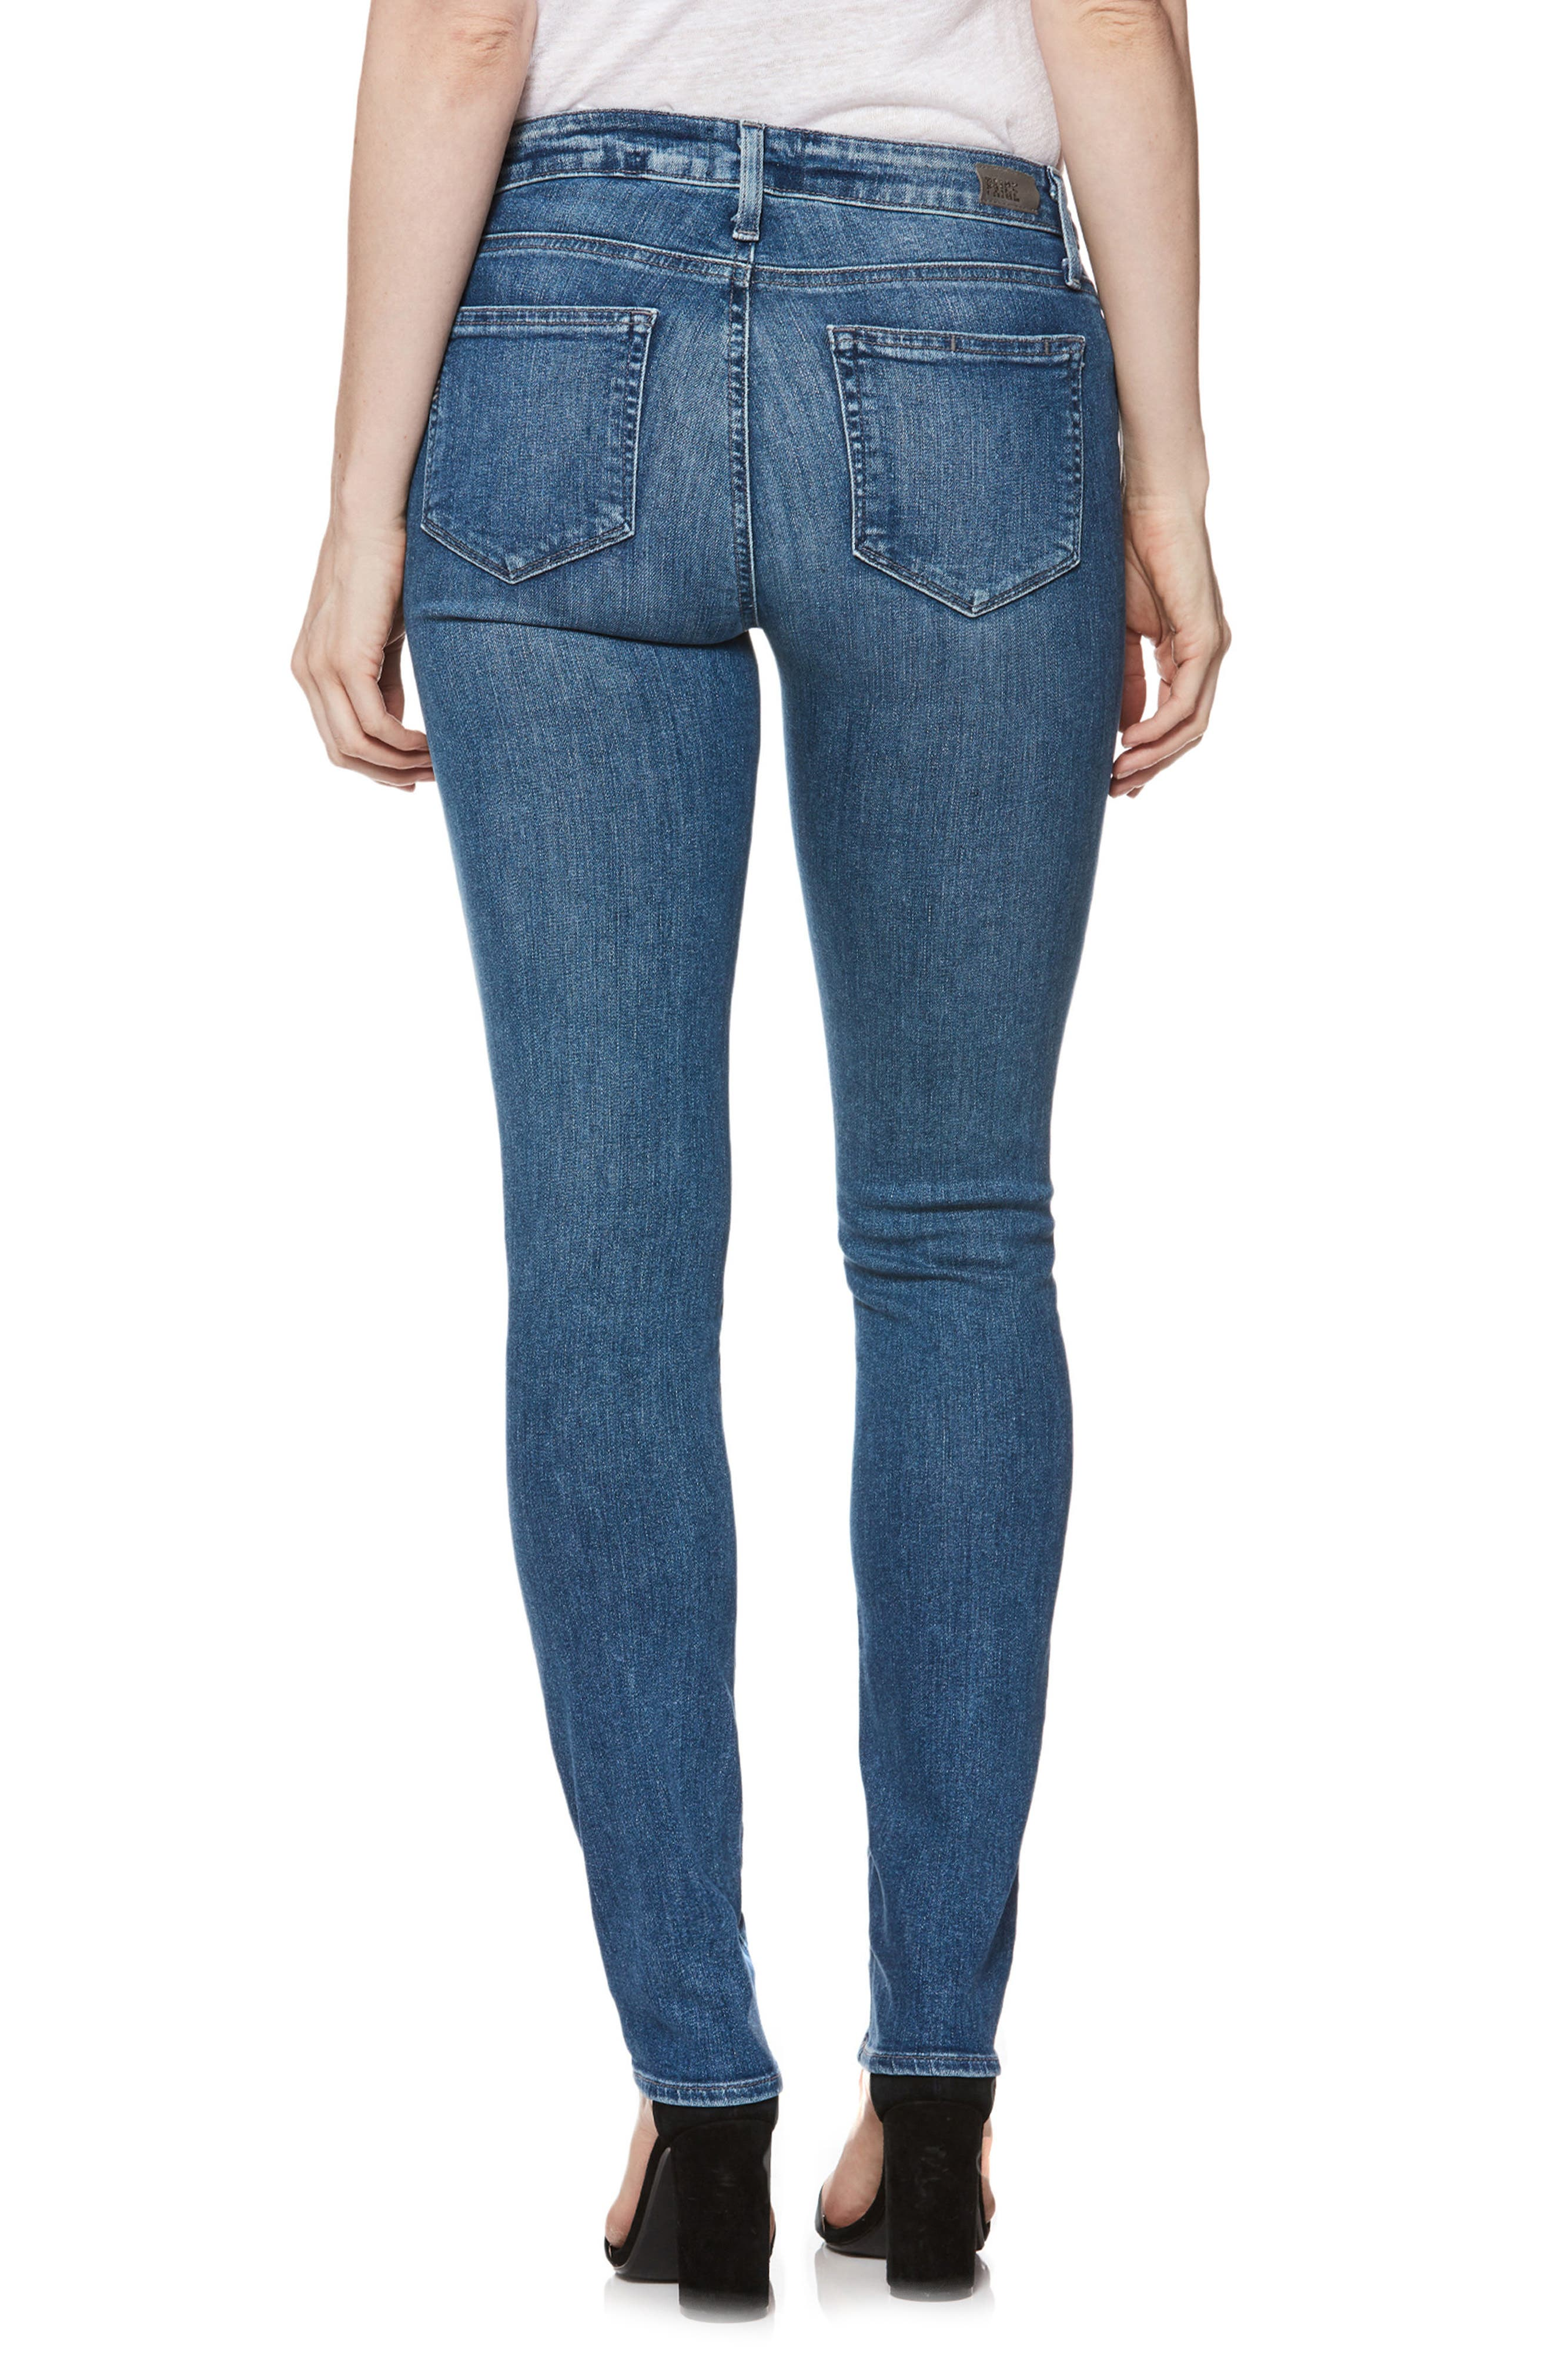 Transcend Vintage - Skyline Skinny Jeans,                             Alternate thumbnail 2, color,                             Bloomfield